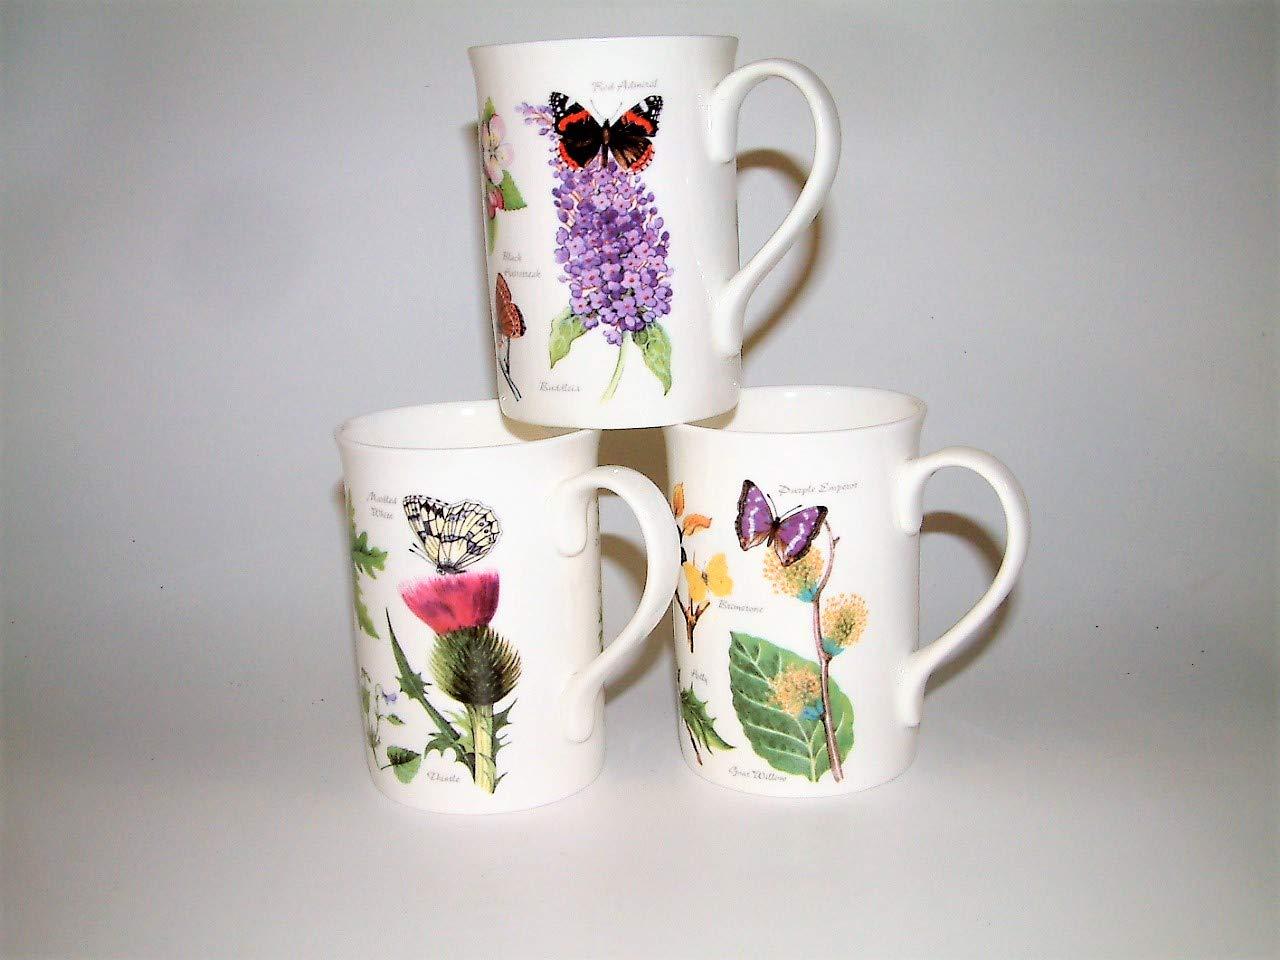 Bone china mugs with wild flowers & butterflies design a set of 3 mugs dishwasher safe Old Sun Pottery M1033